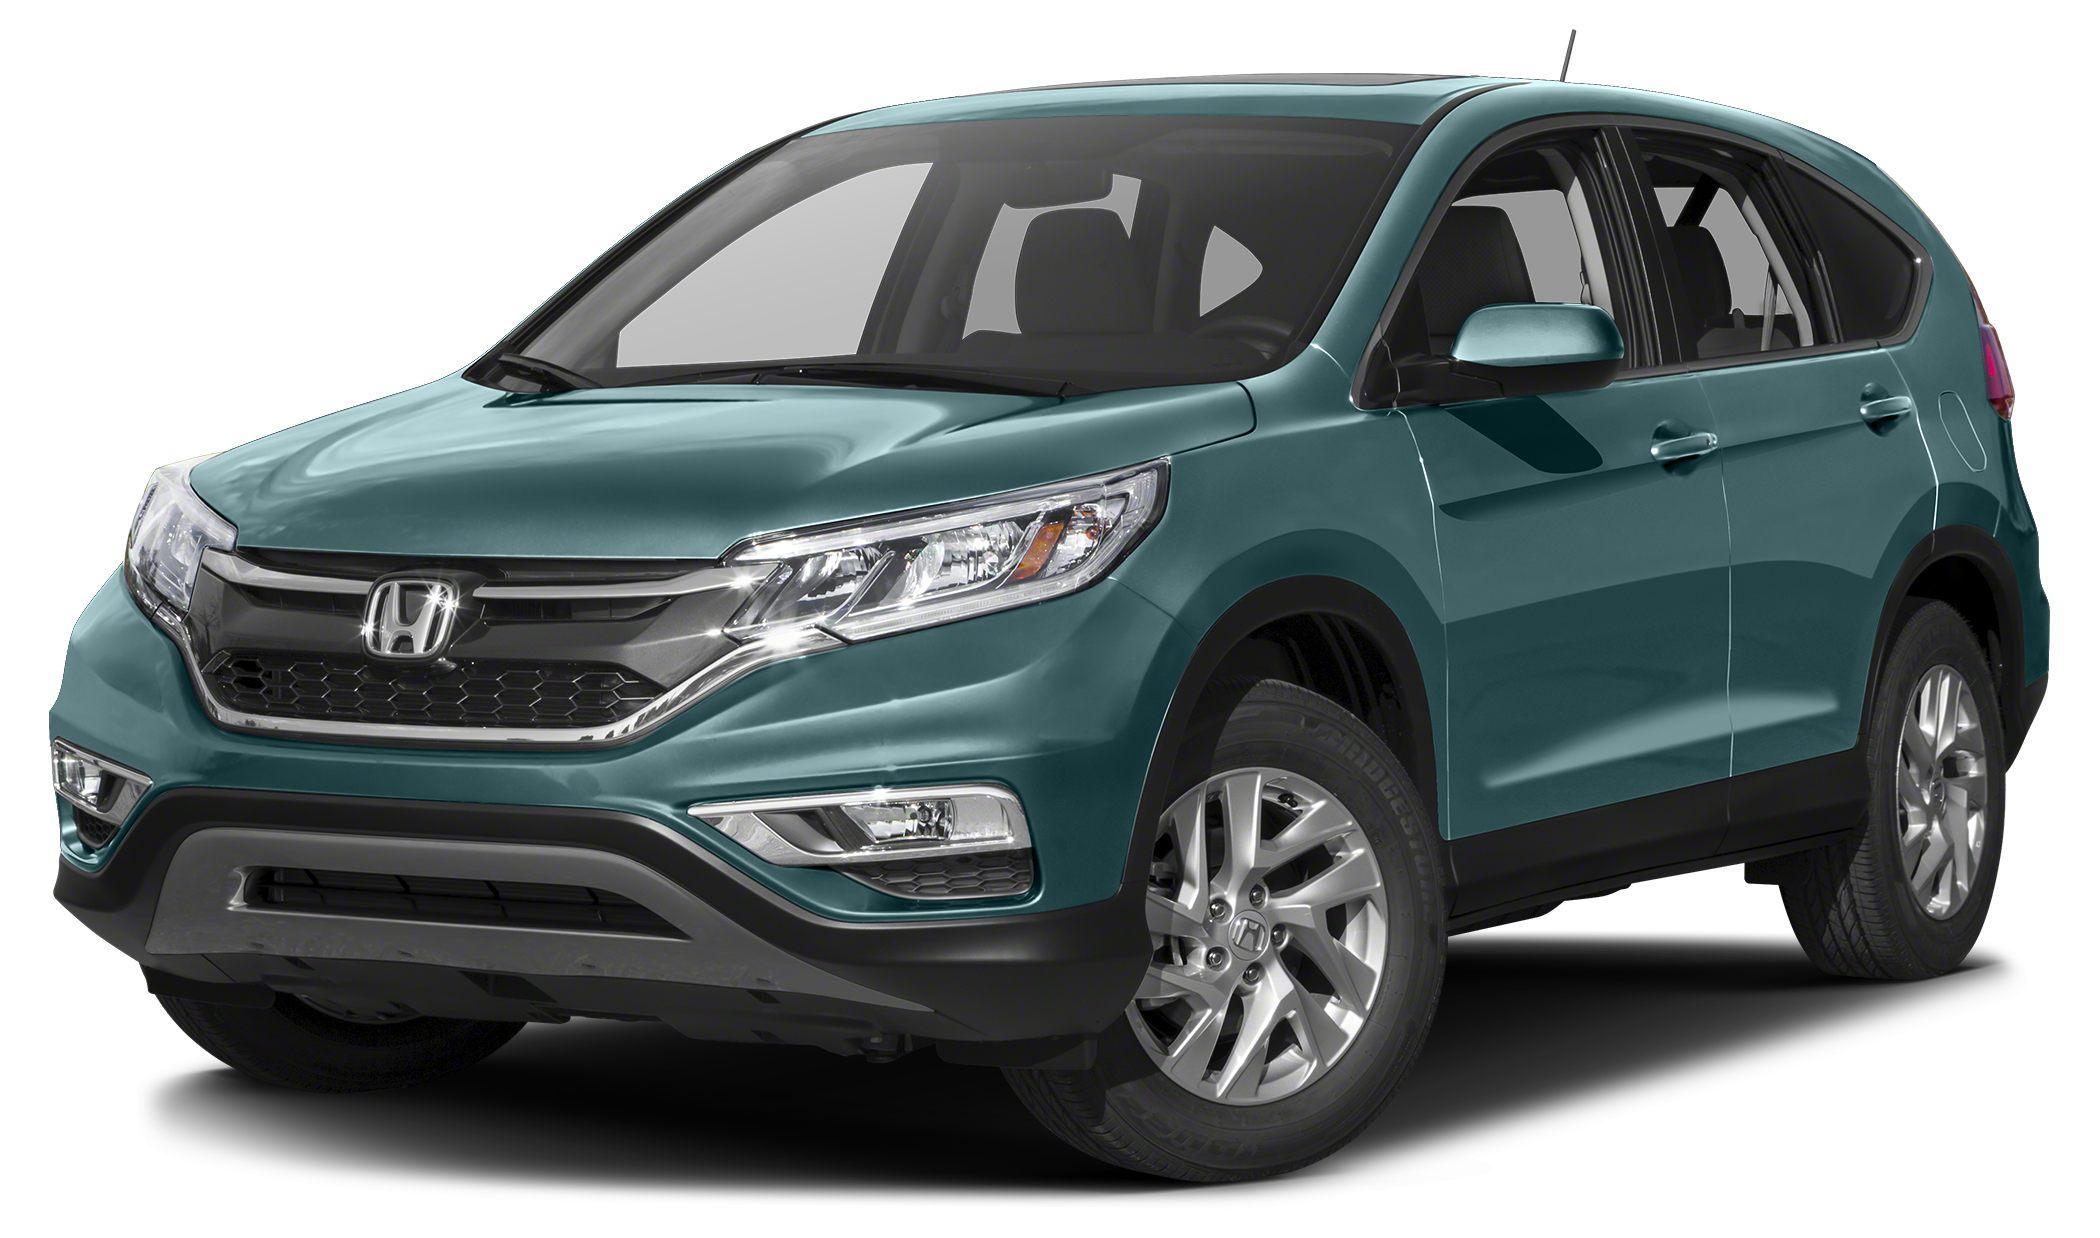 2016 Honda CR-V EX Buy a new Honda from Diamond Valley Honda in Hemet and obtain Lifetime Oil Chan